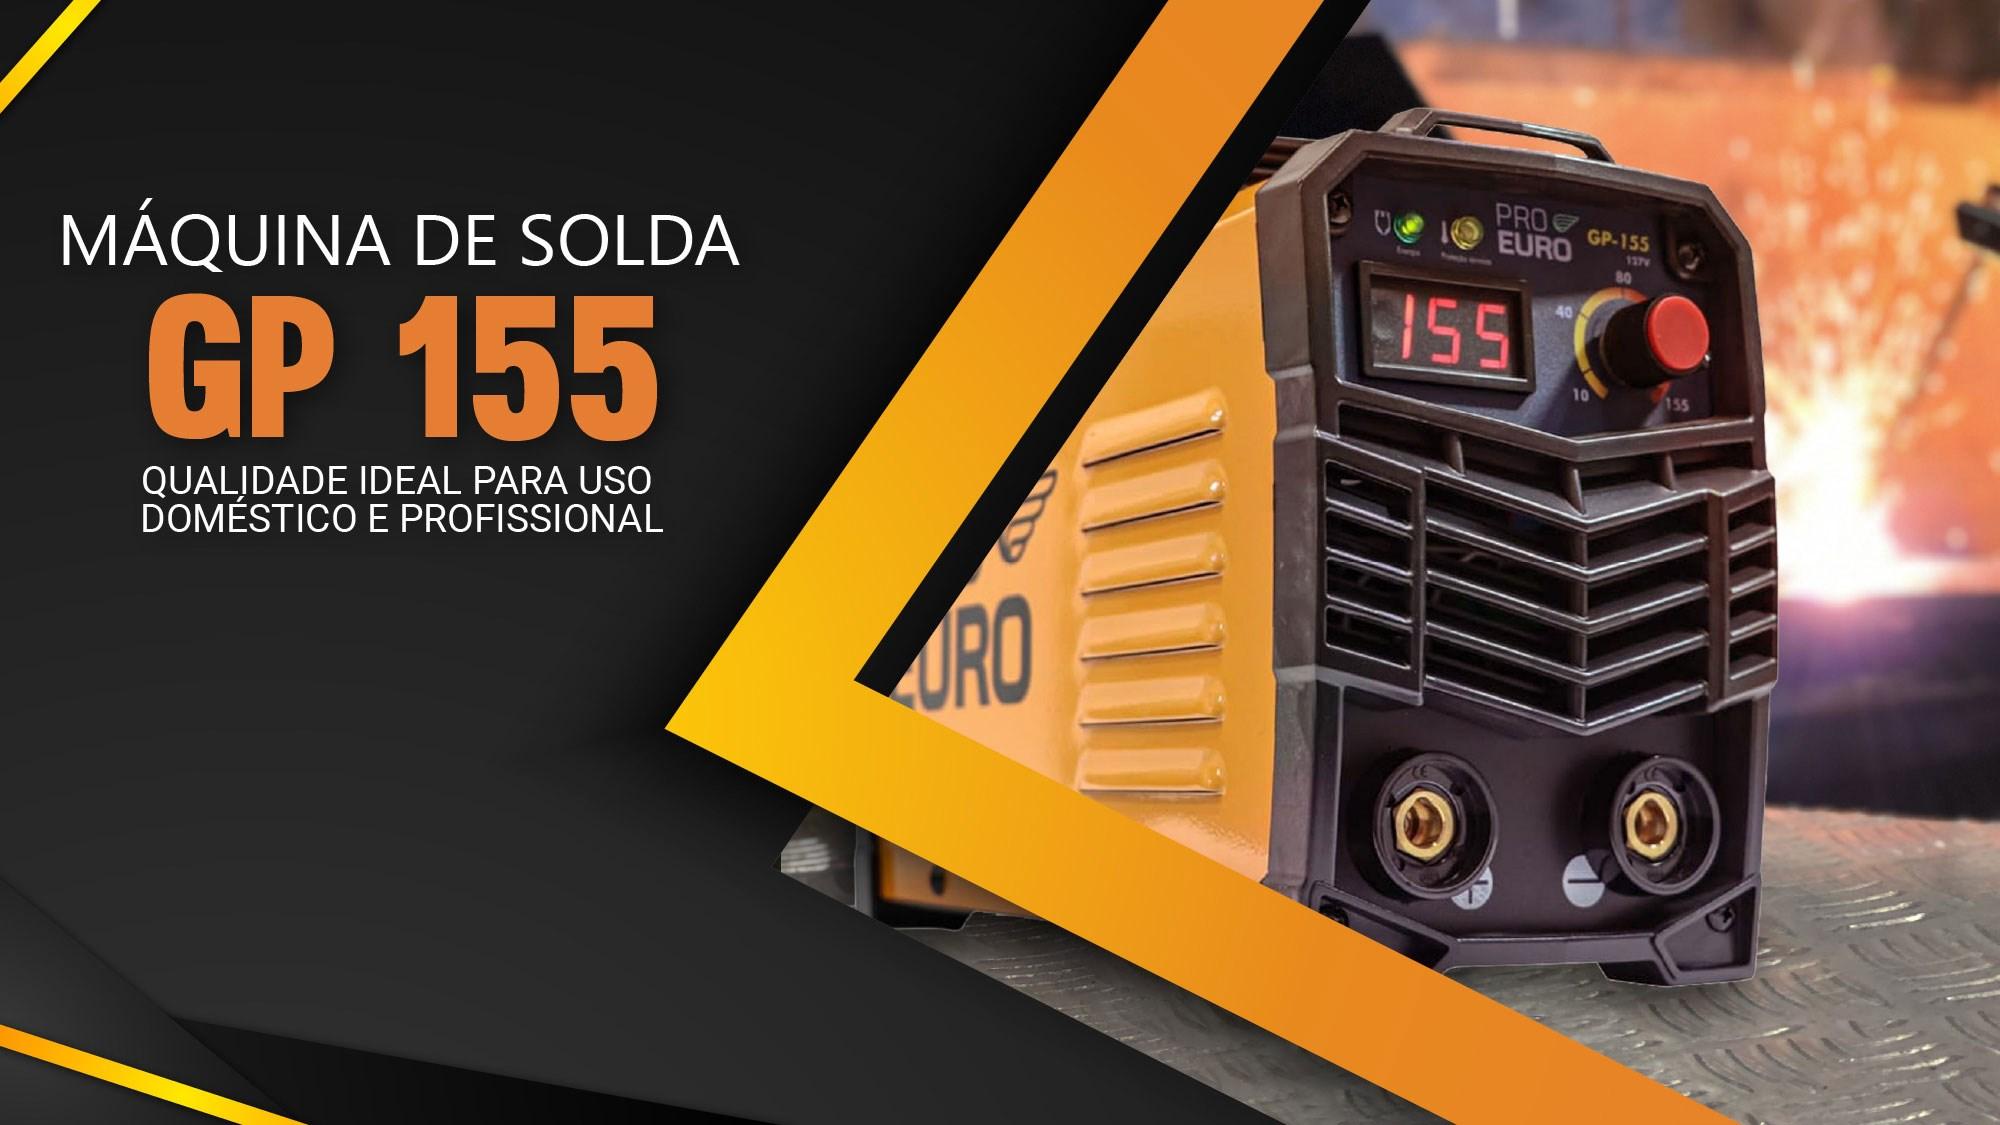 GP 155 - Pró Euro